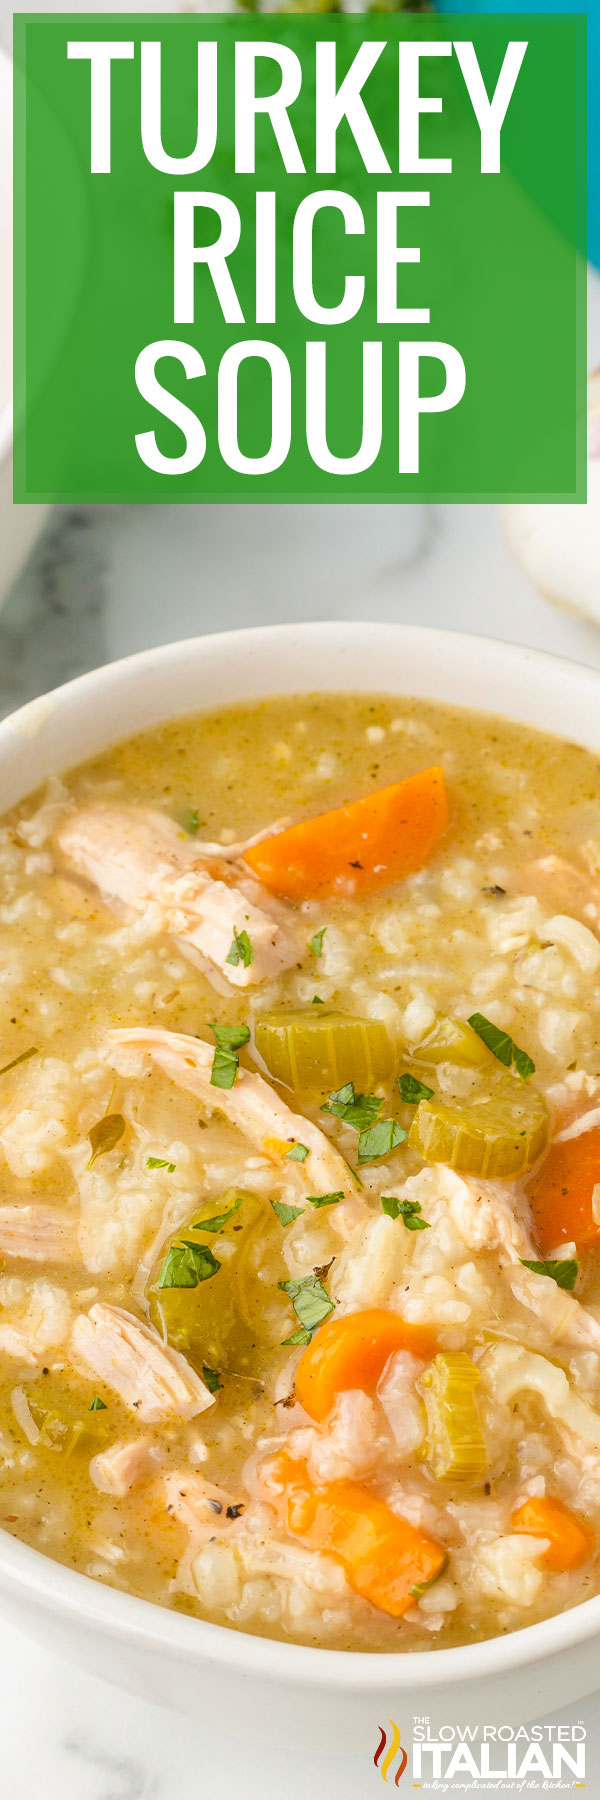 Turkey Rice Soup closeup